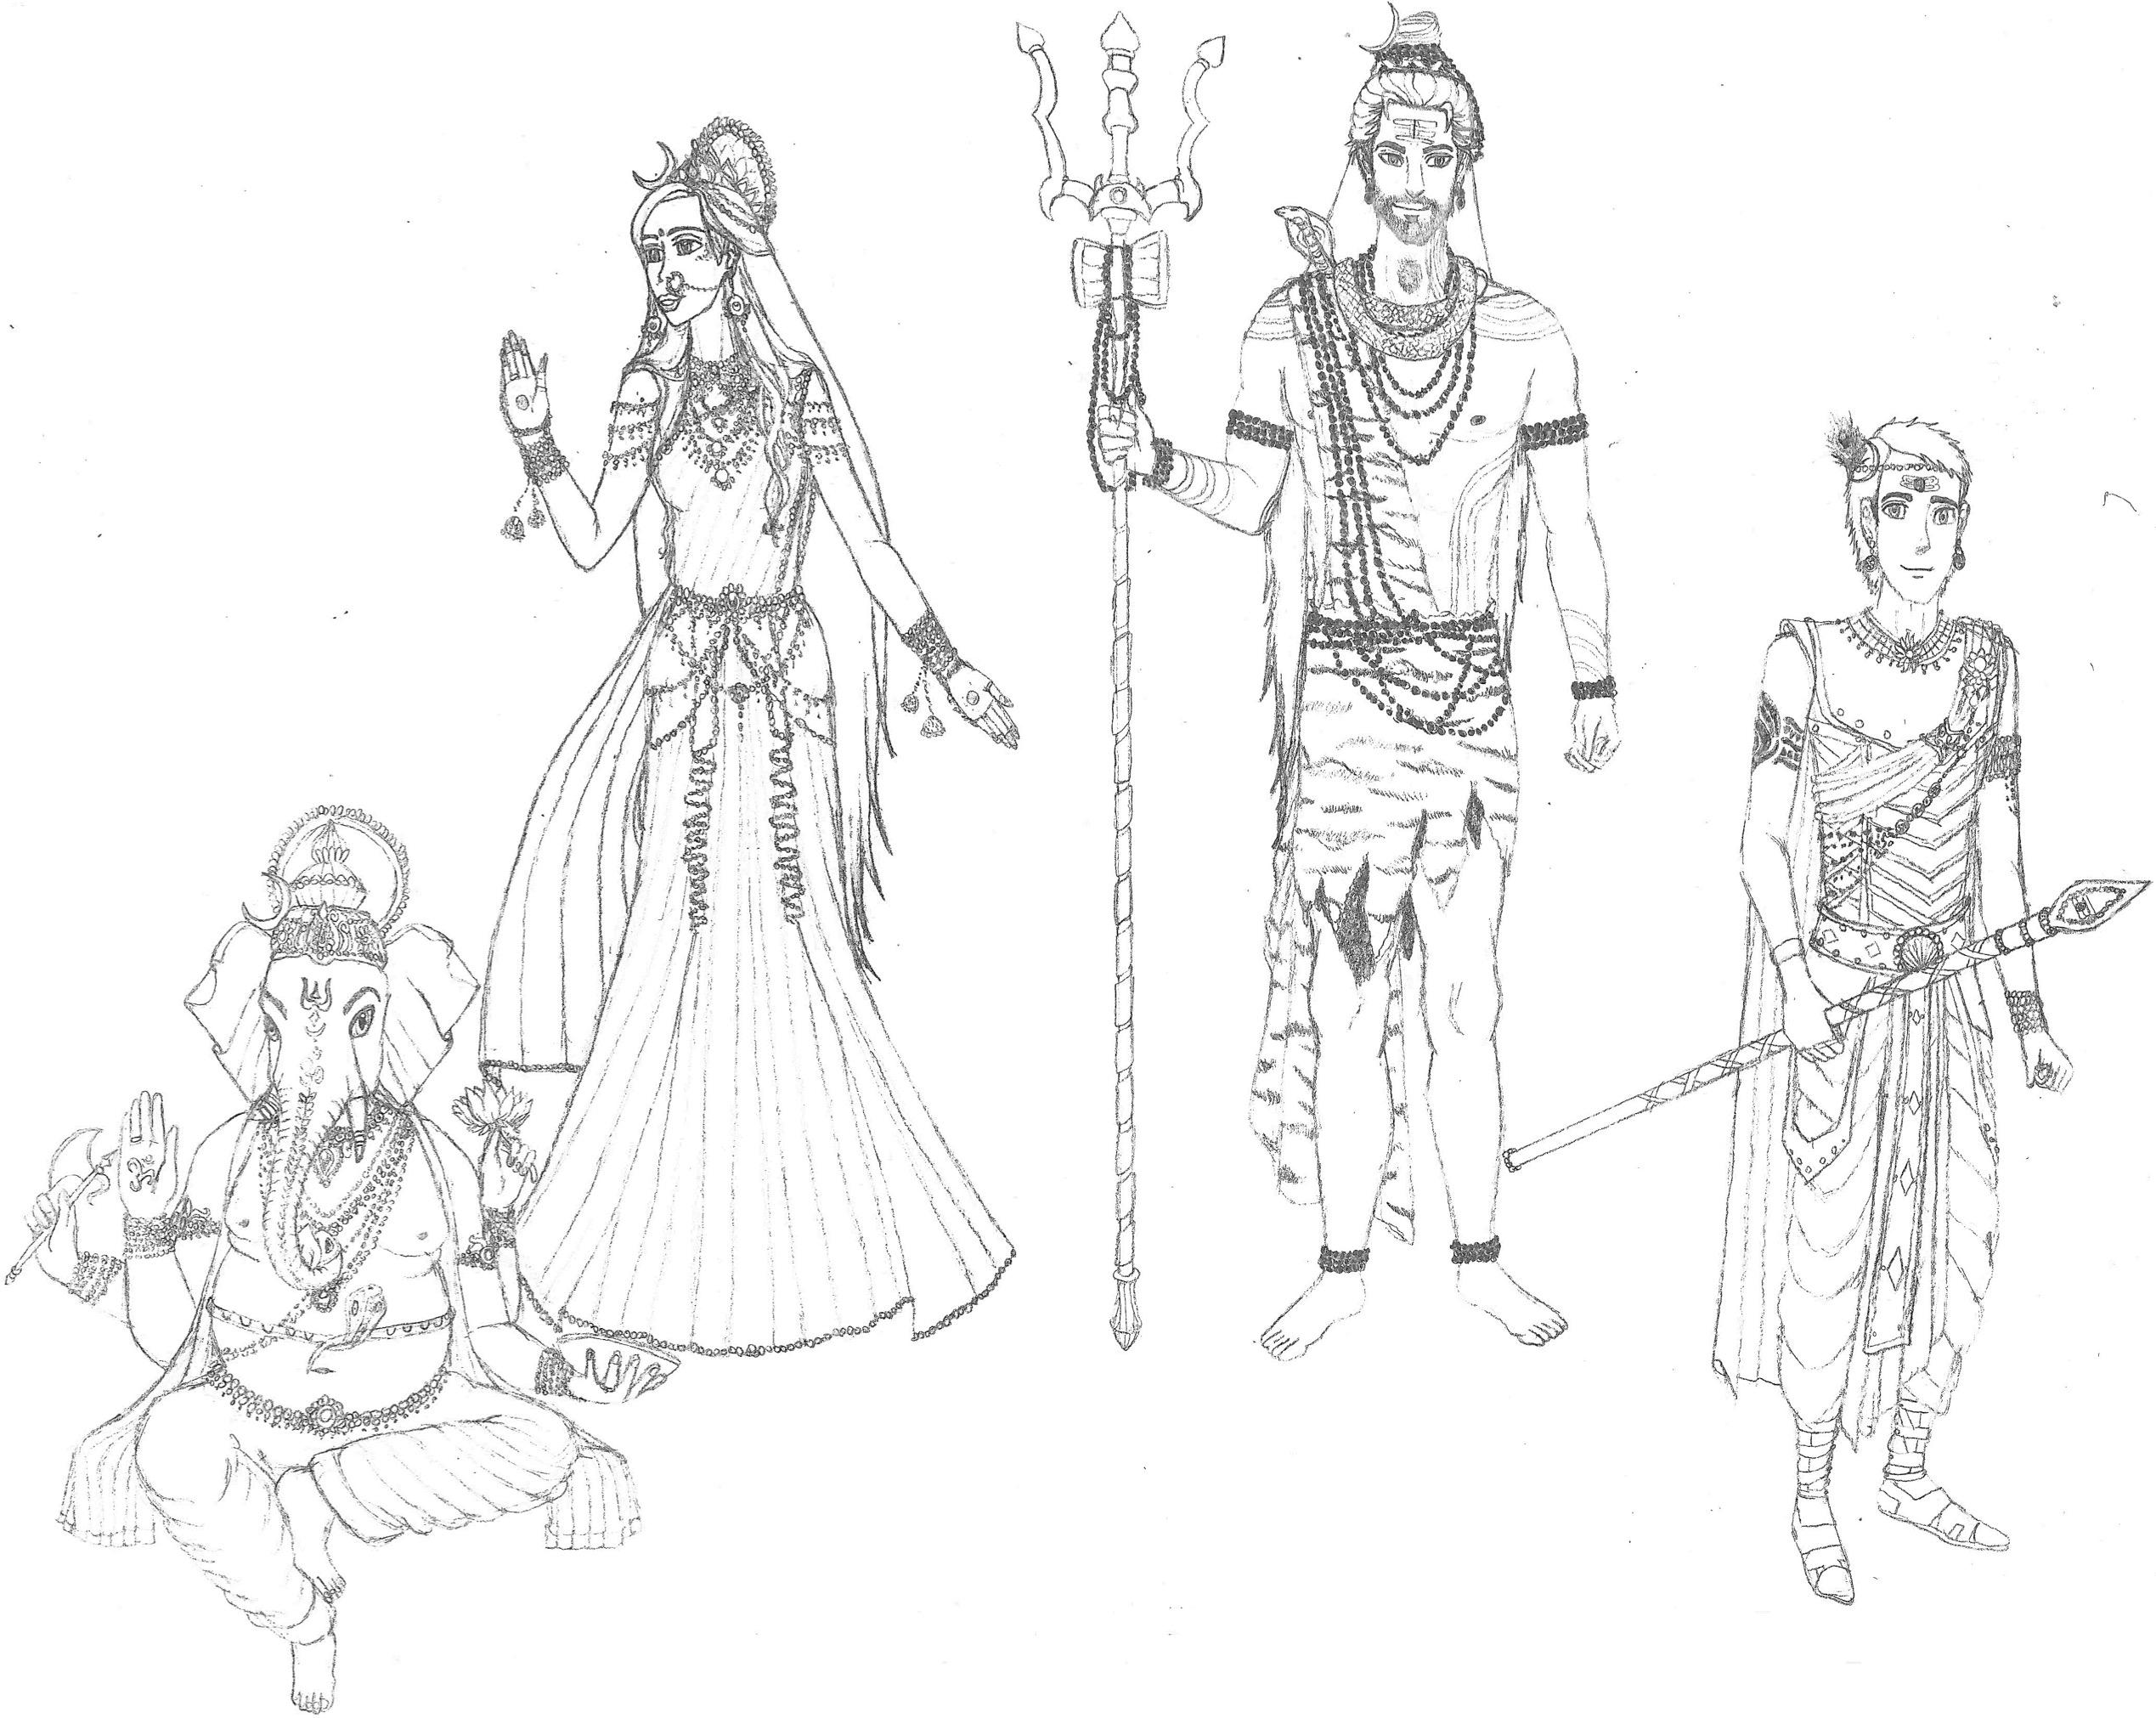 Shiva Parvati Ganesha And Karttikeya By R3m1stikn On Deviantart